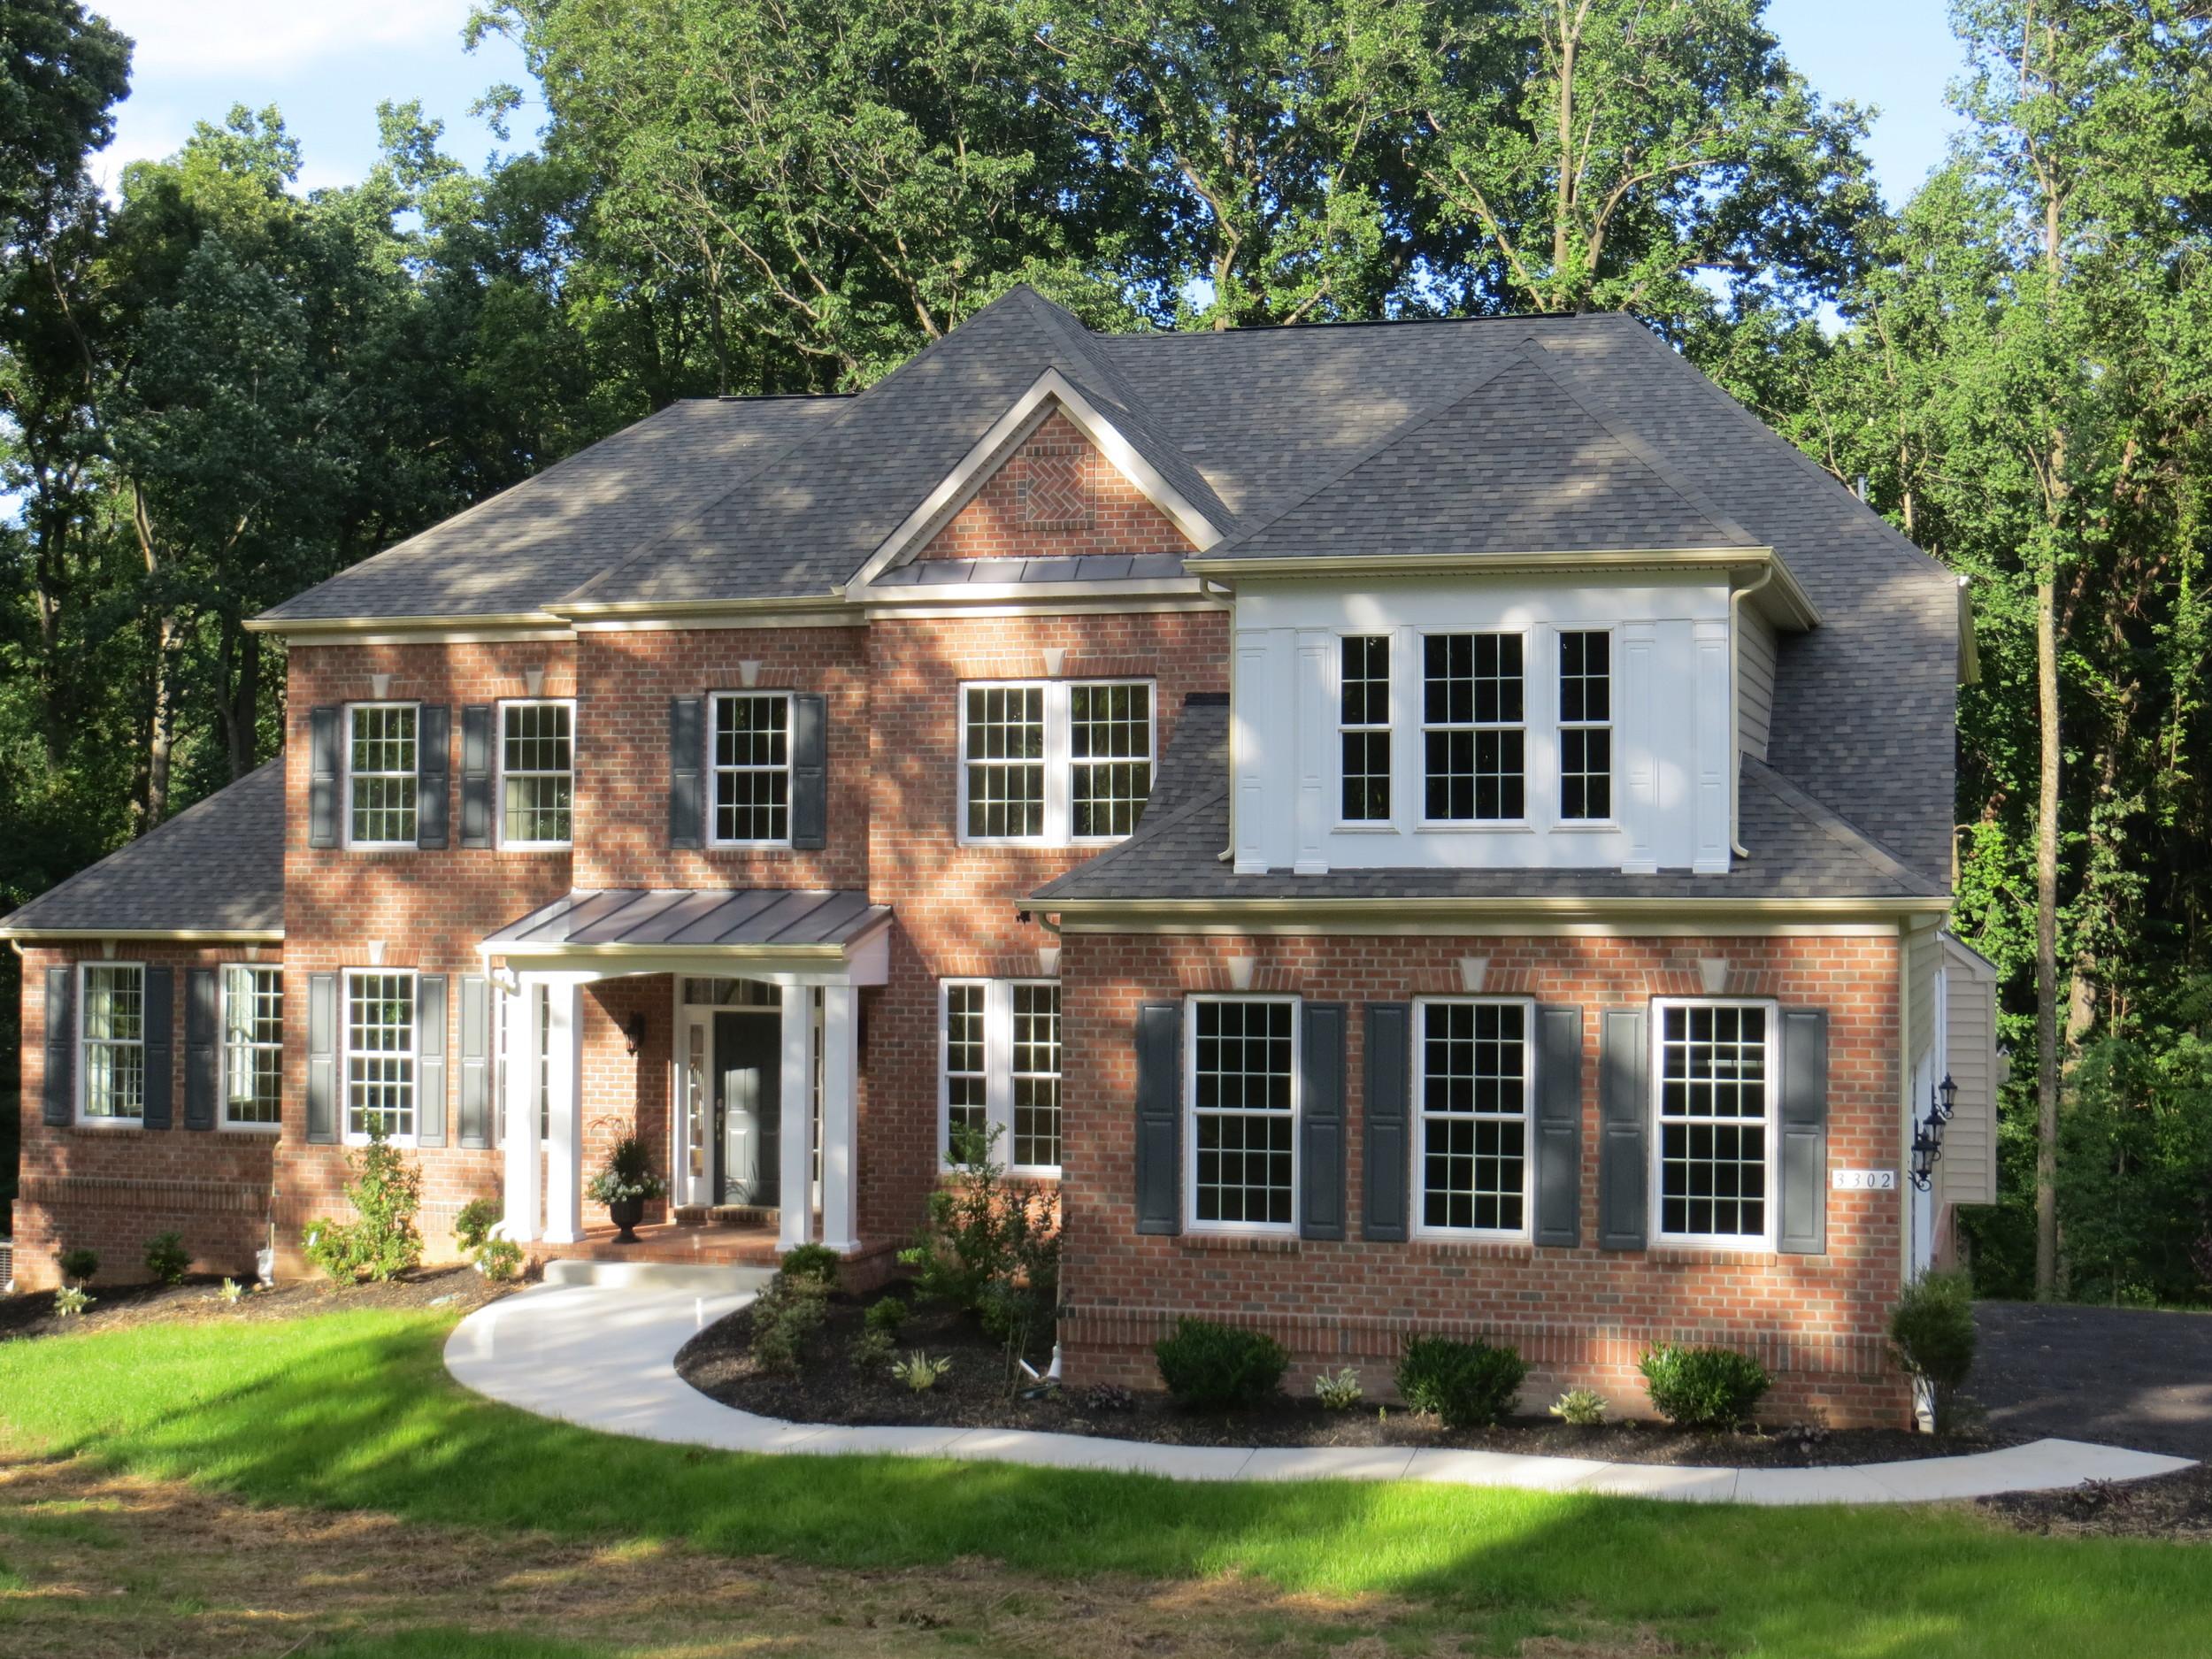 rylea-homes-custom-home-9.jpeg